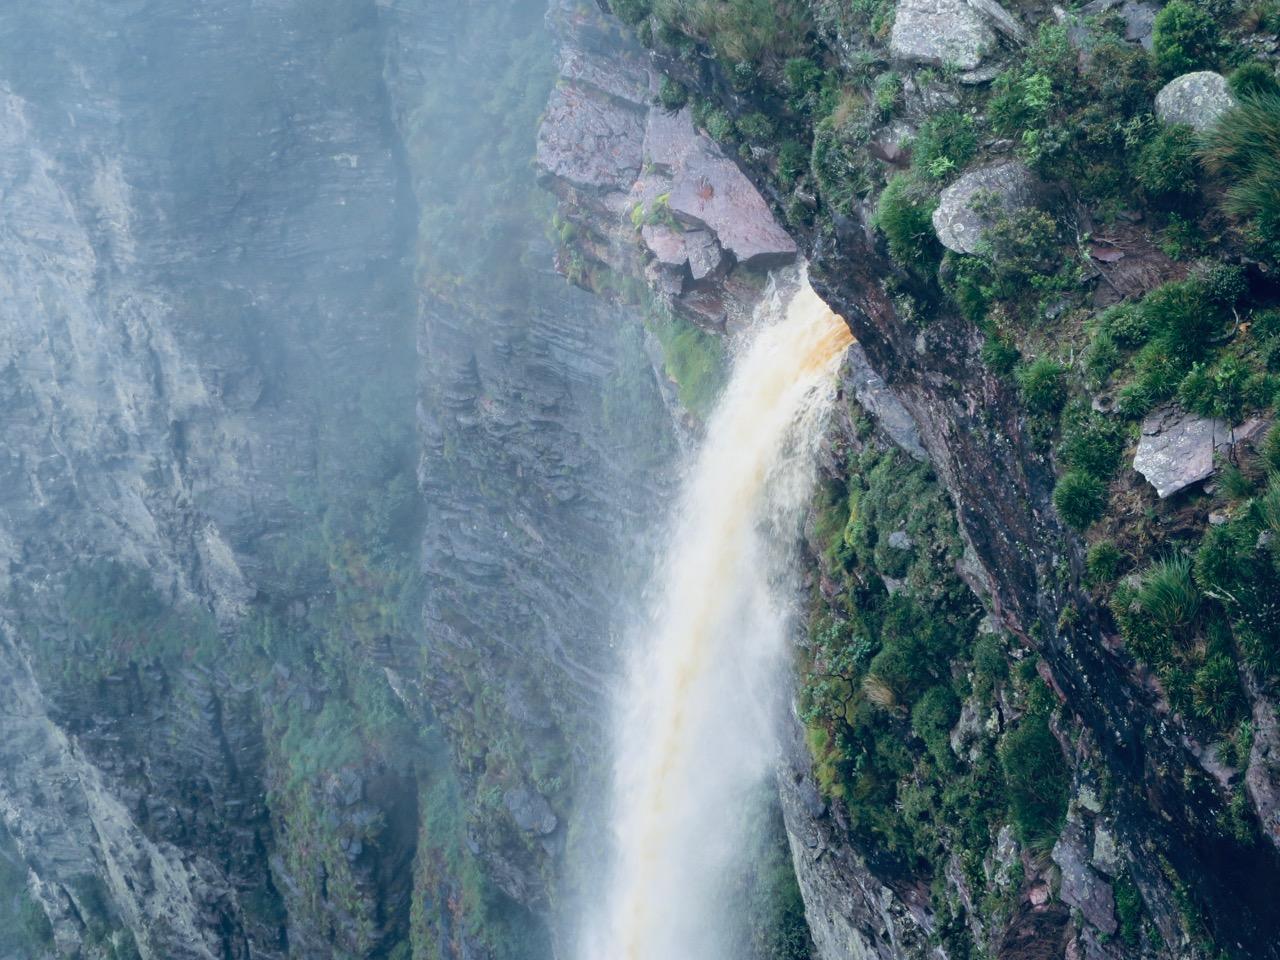 A Cachoeira da Fumaca